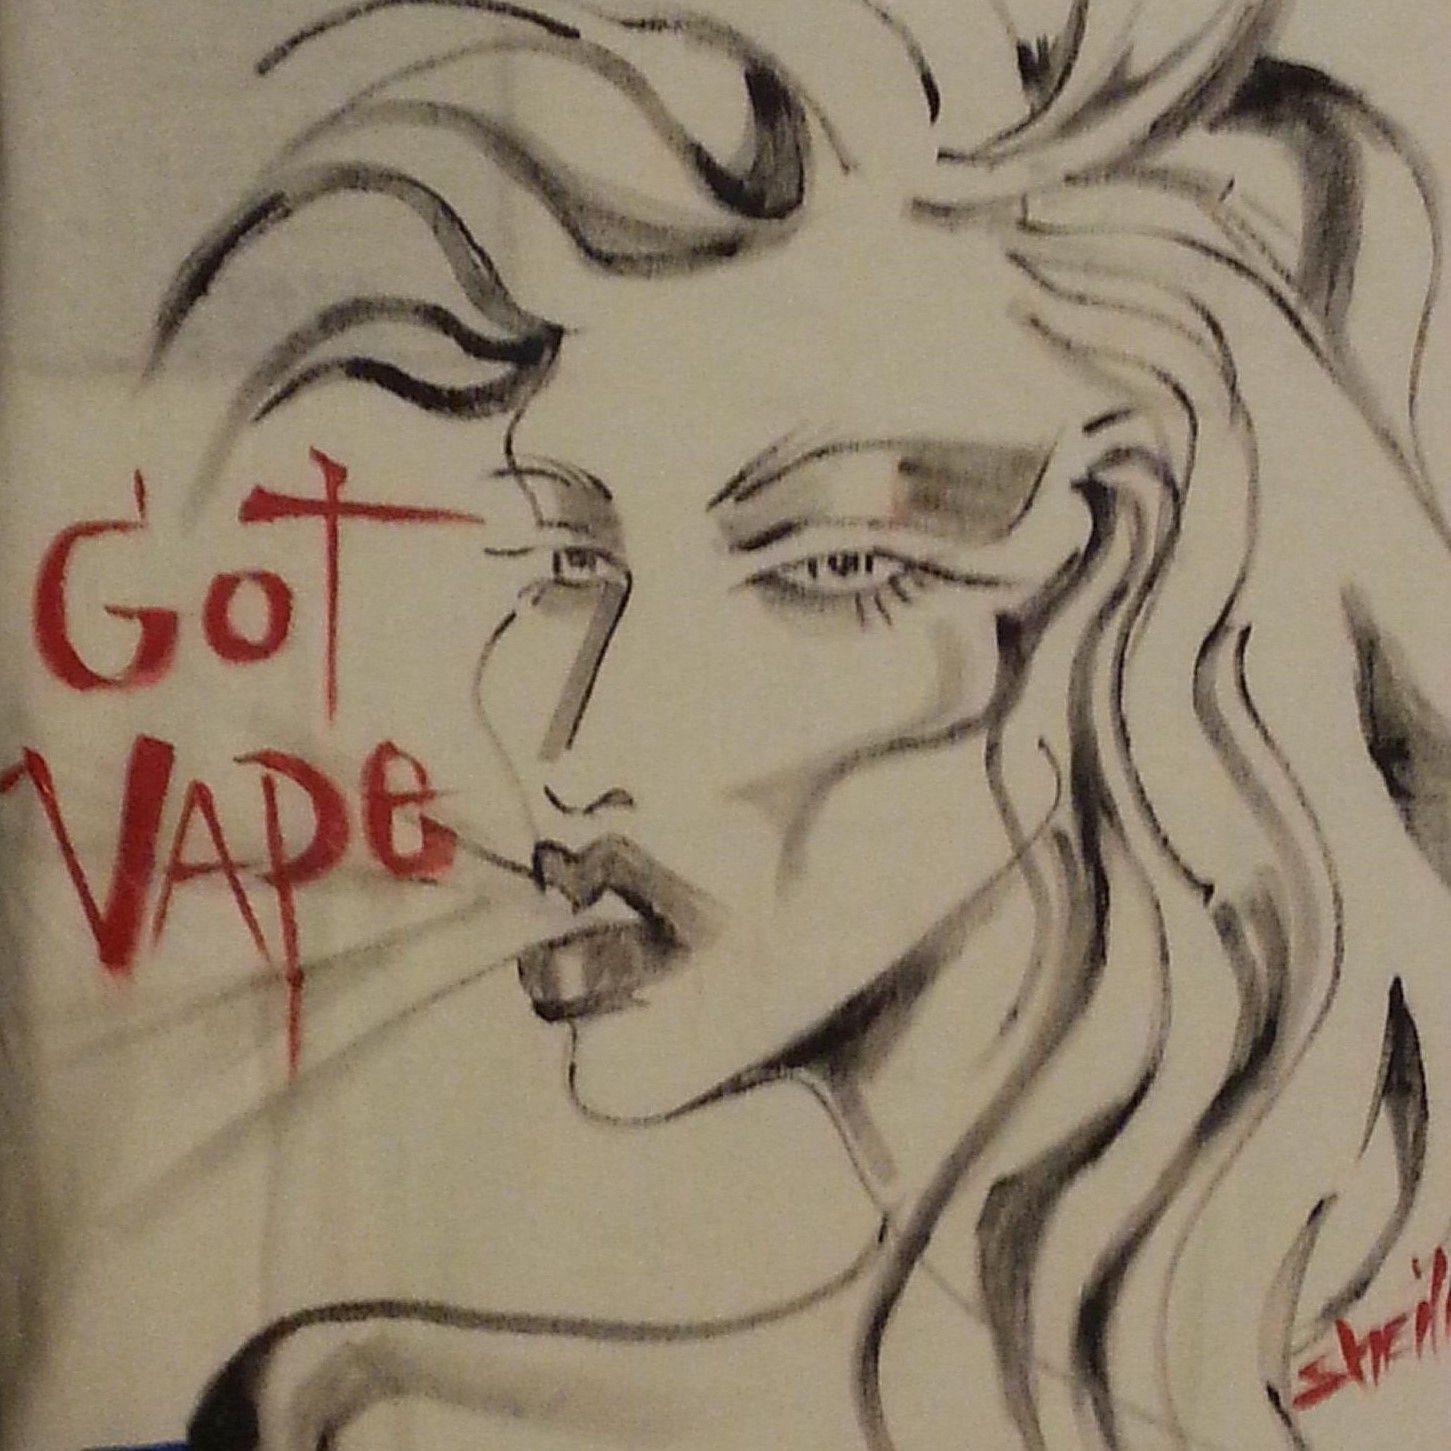 Shirts For Vape Shops Vape Queen 011 Punk Comic Fantasy Fashion Glam Industrial Alternative Counter Culture Vaporizer Art H Vape Art Art Hand Painted